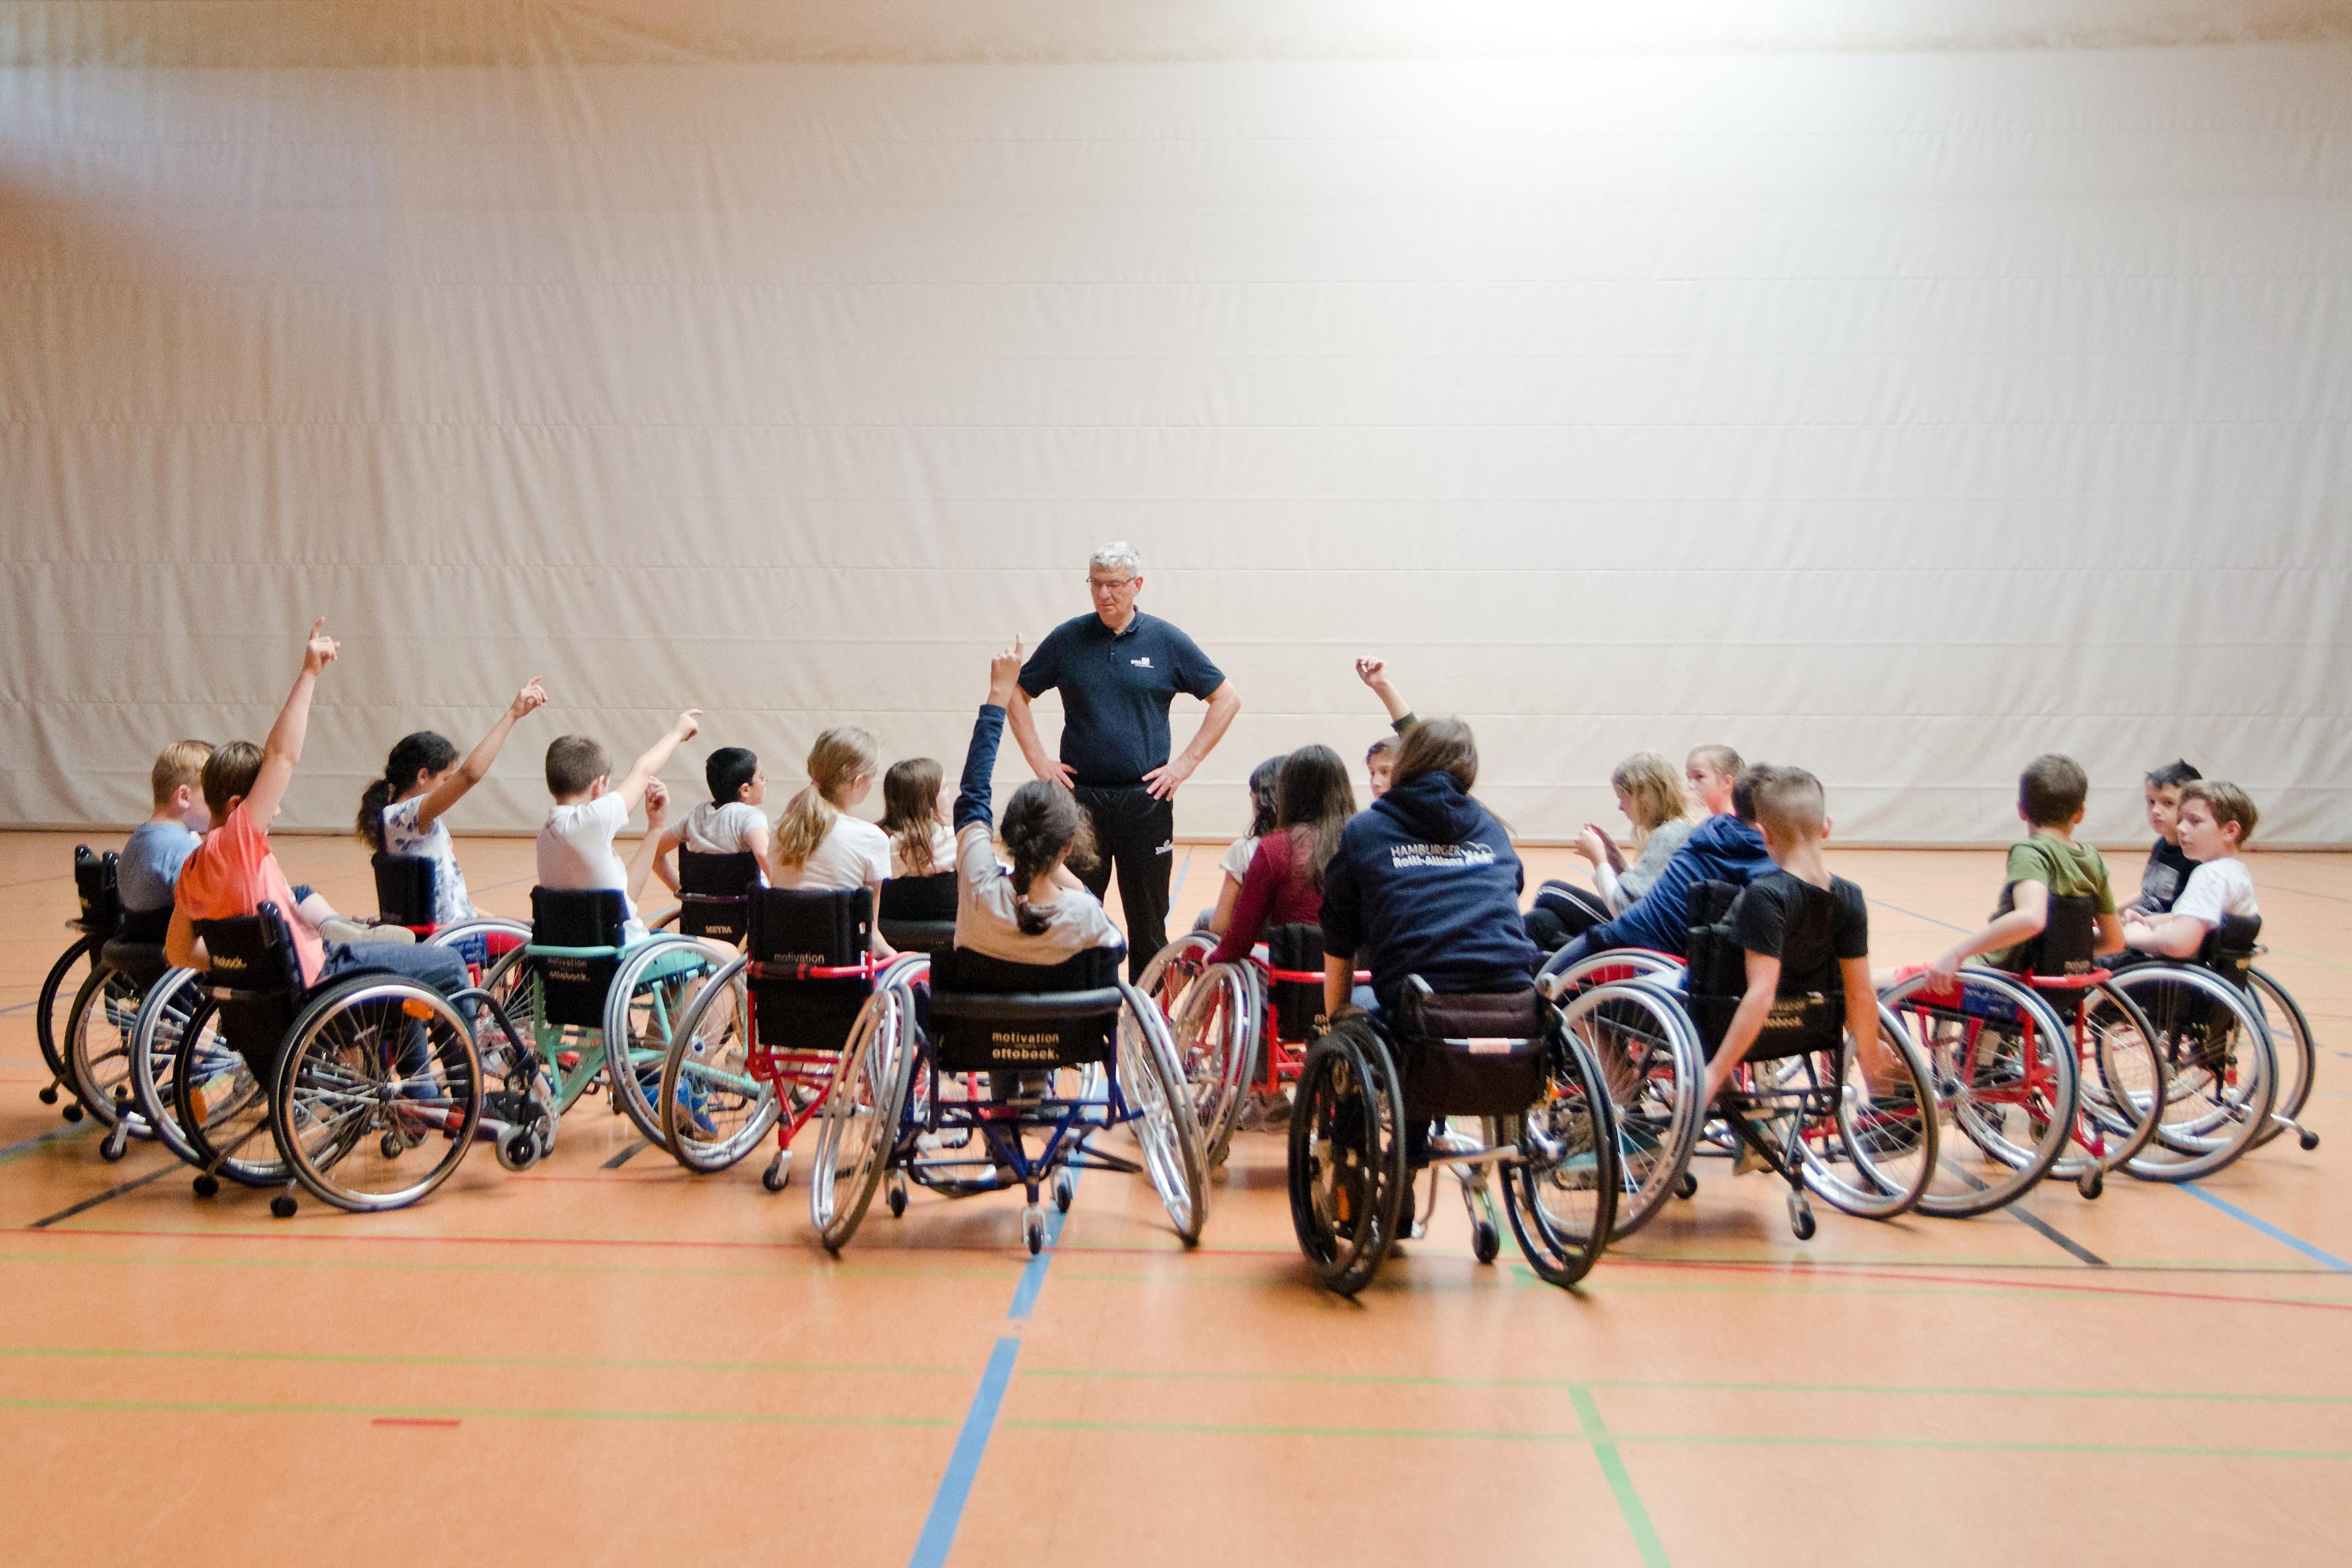 Peter Richarz Rollstuhlsport in Schule